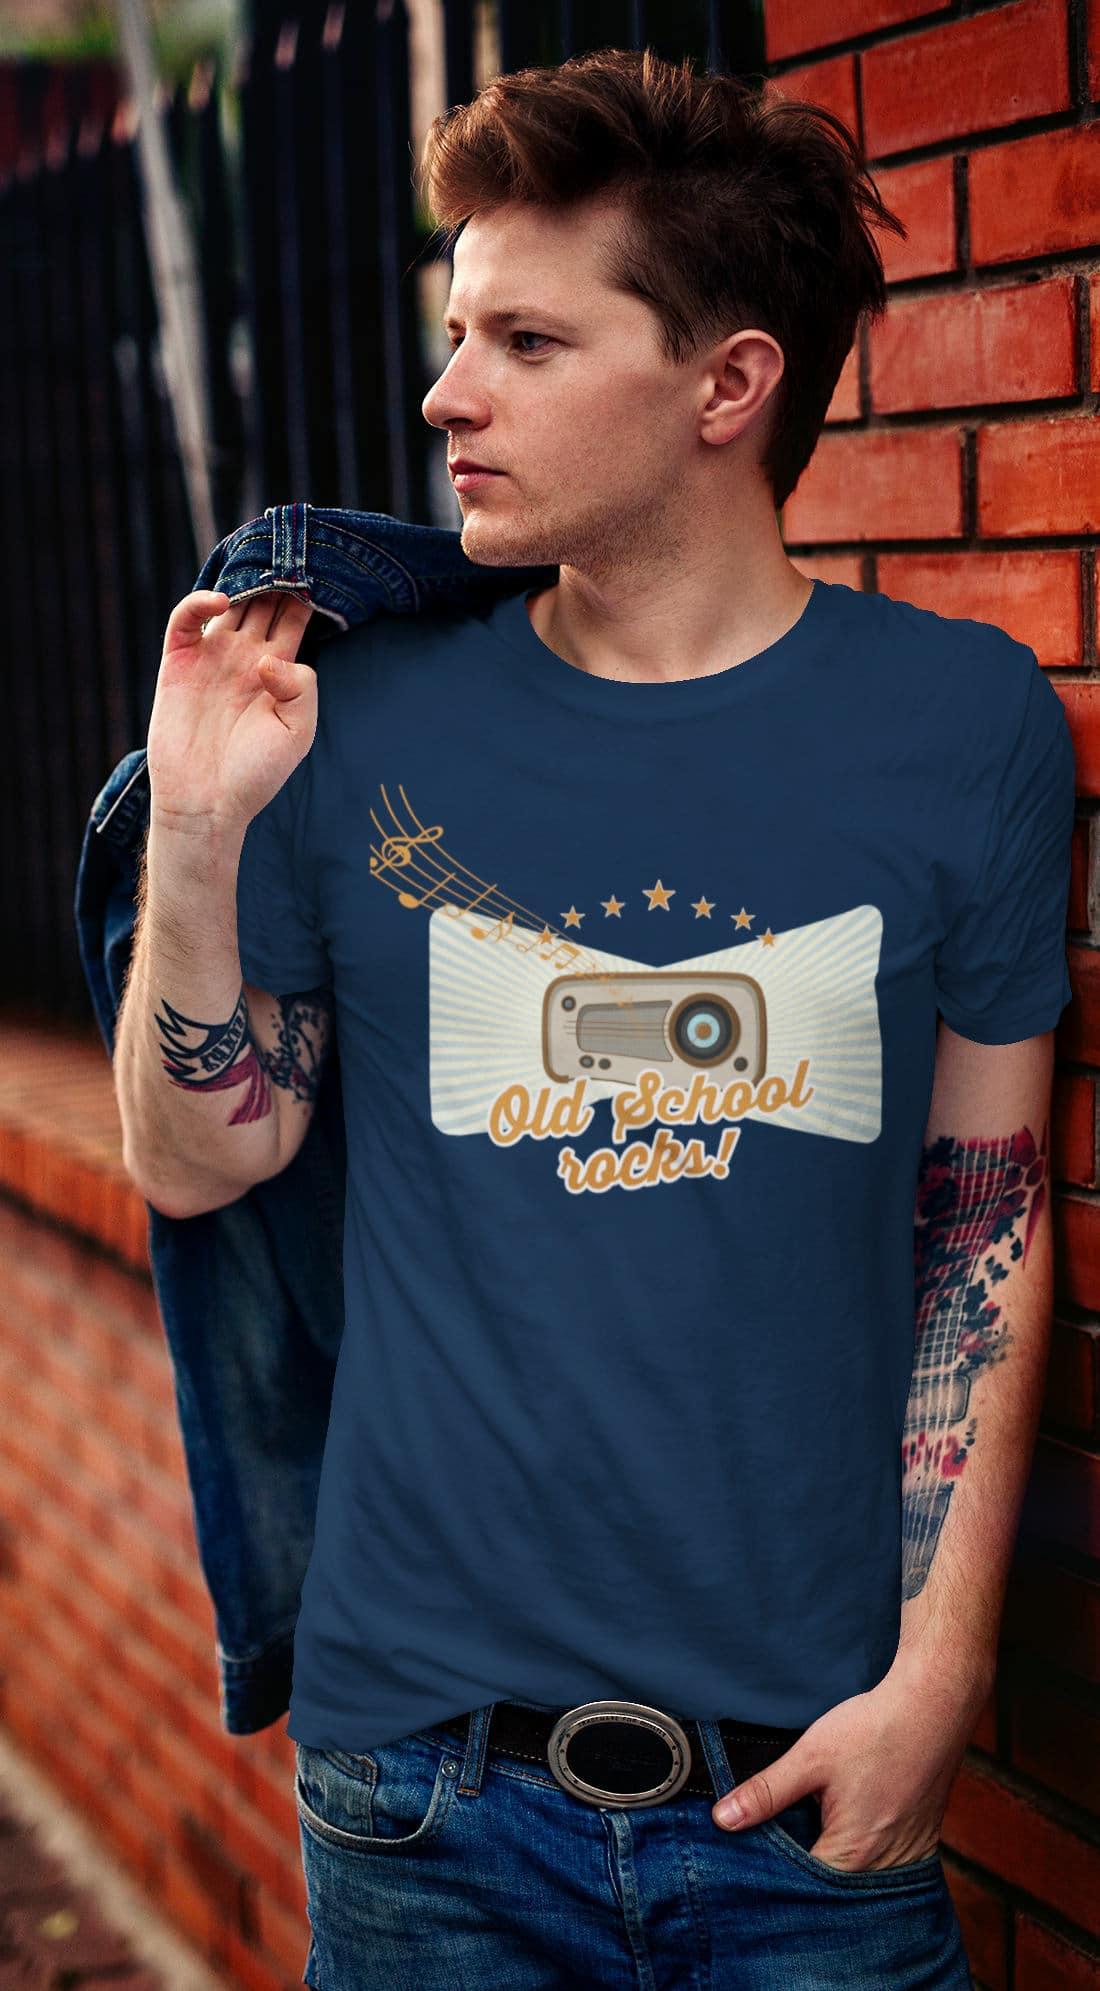 Retro-Vintage-T-Shirt-Old-School-Radio-Music